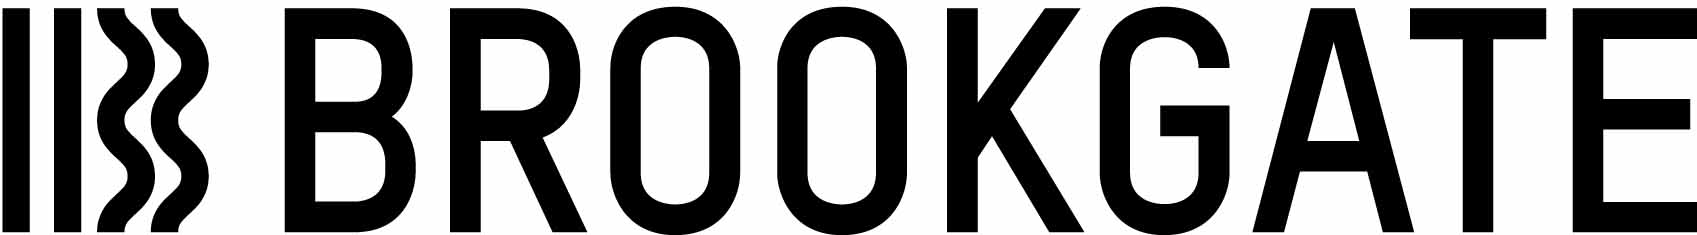 BGate long logo BW.jpg